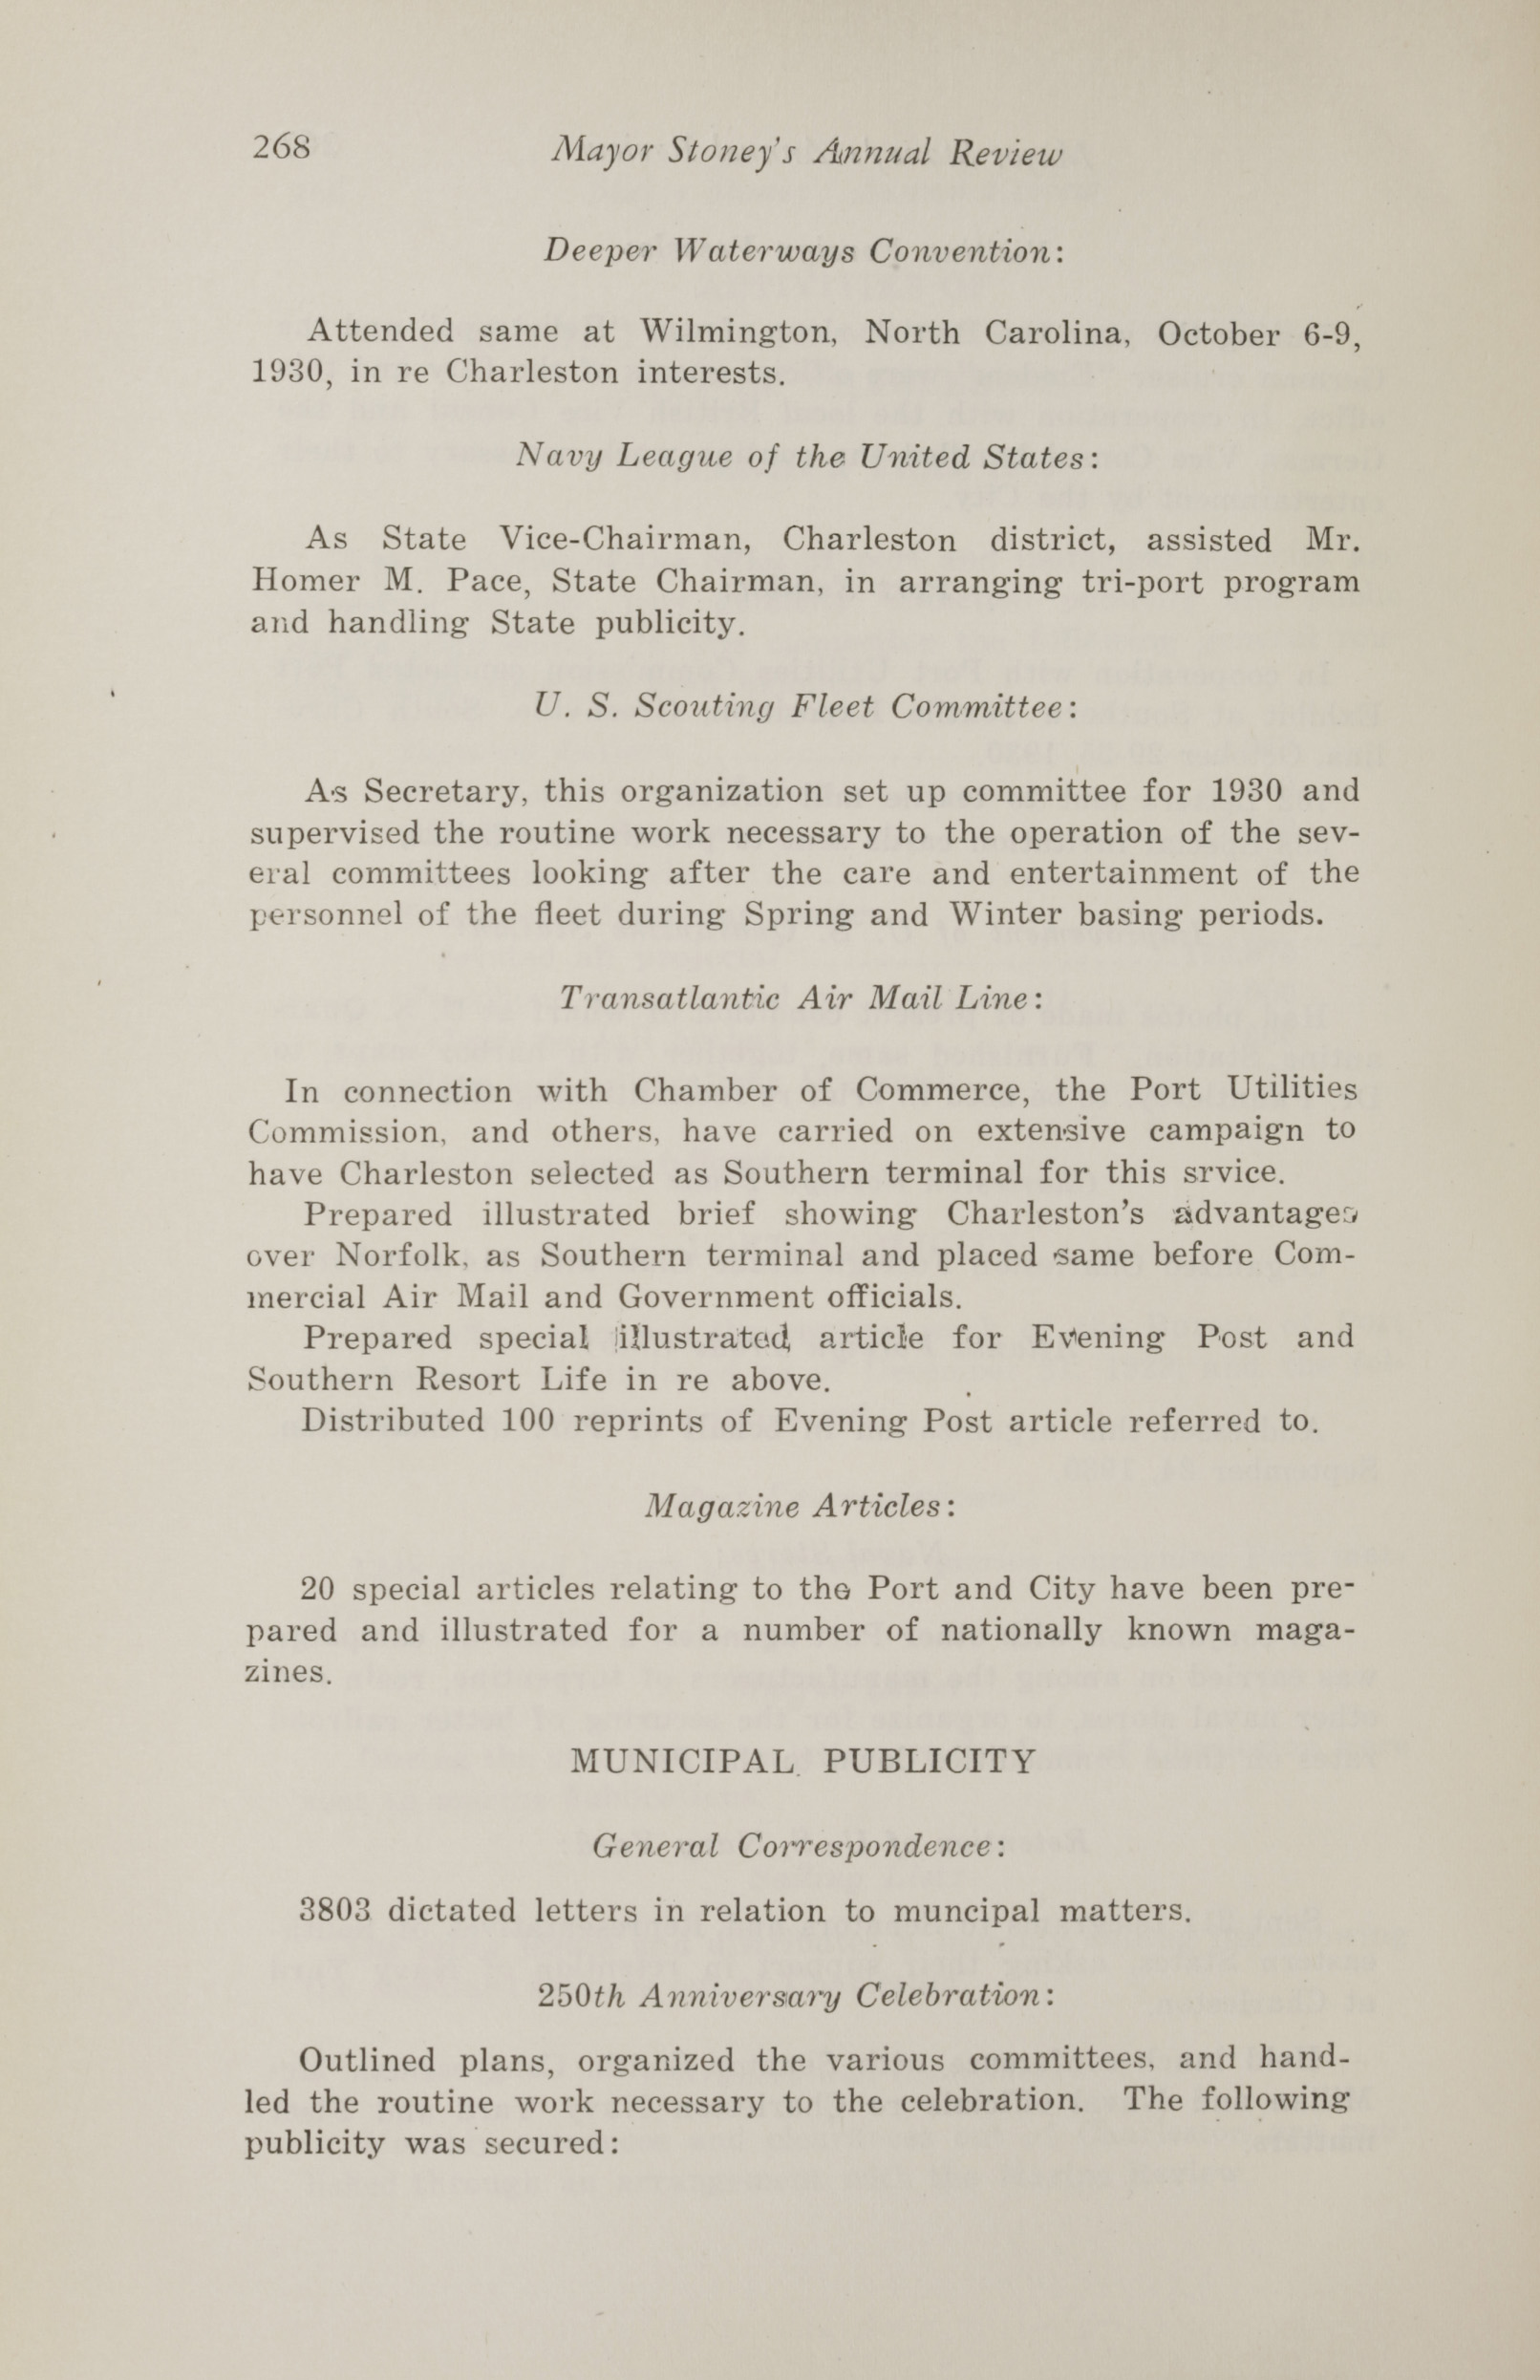 Charleston Yearbook, 1930, page 268